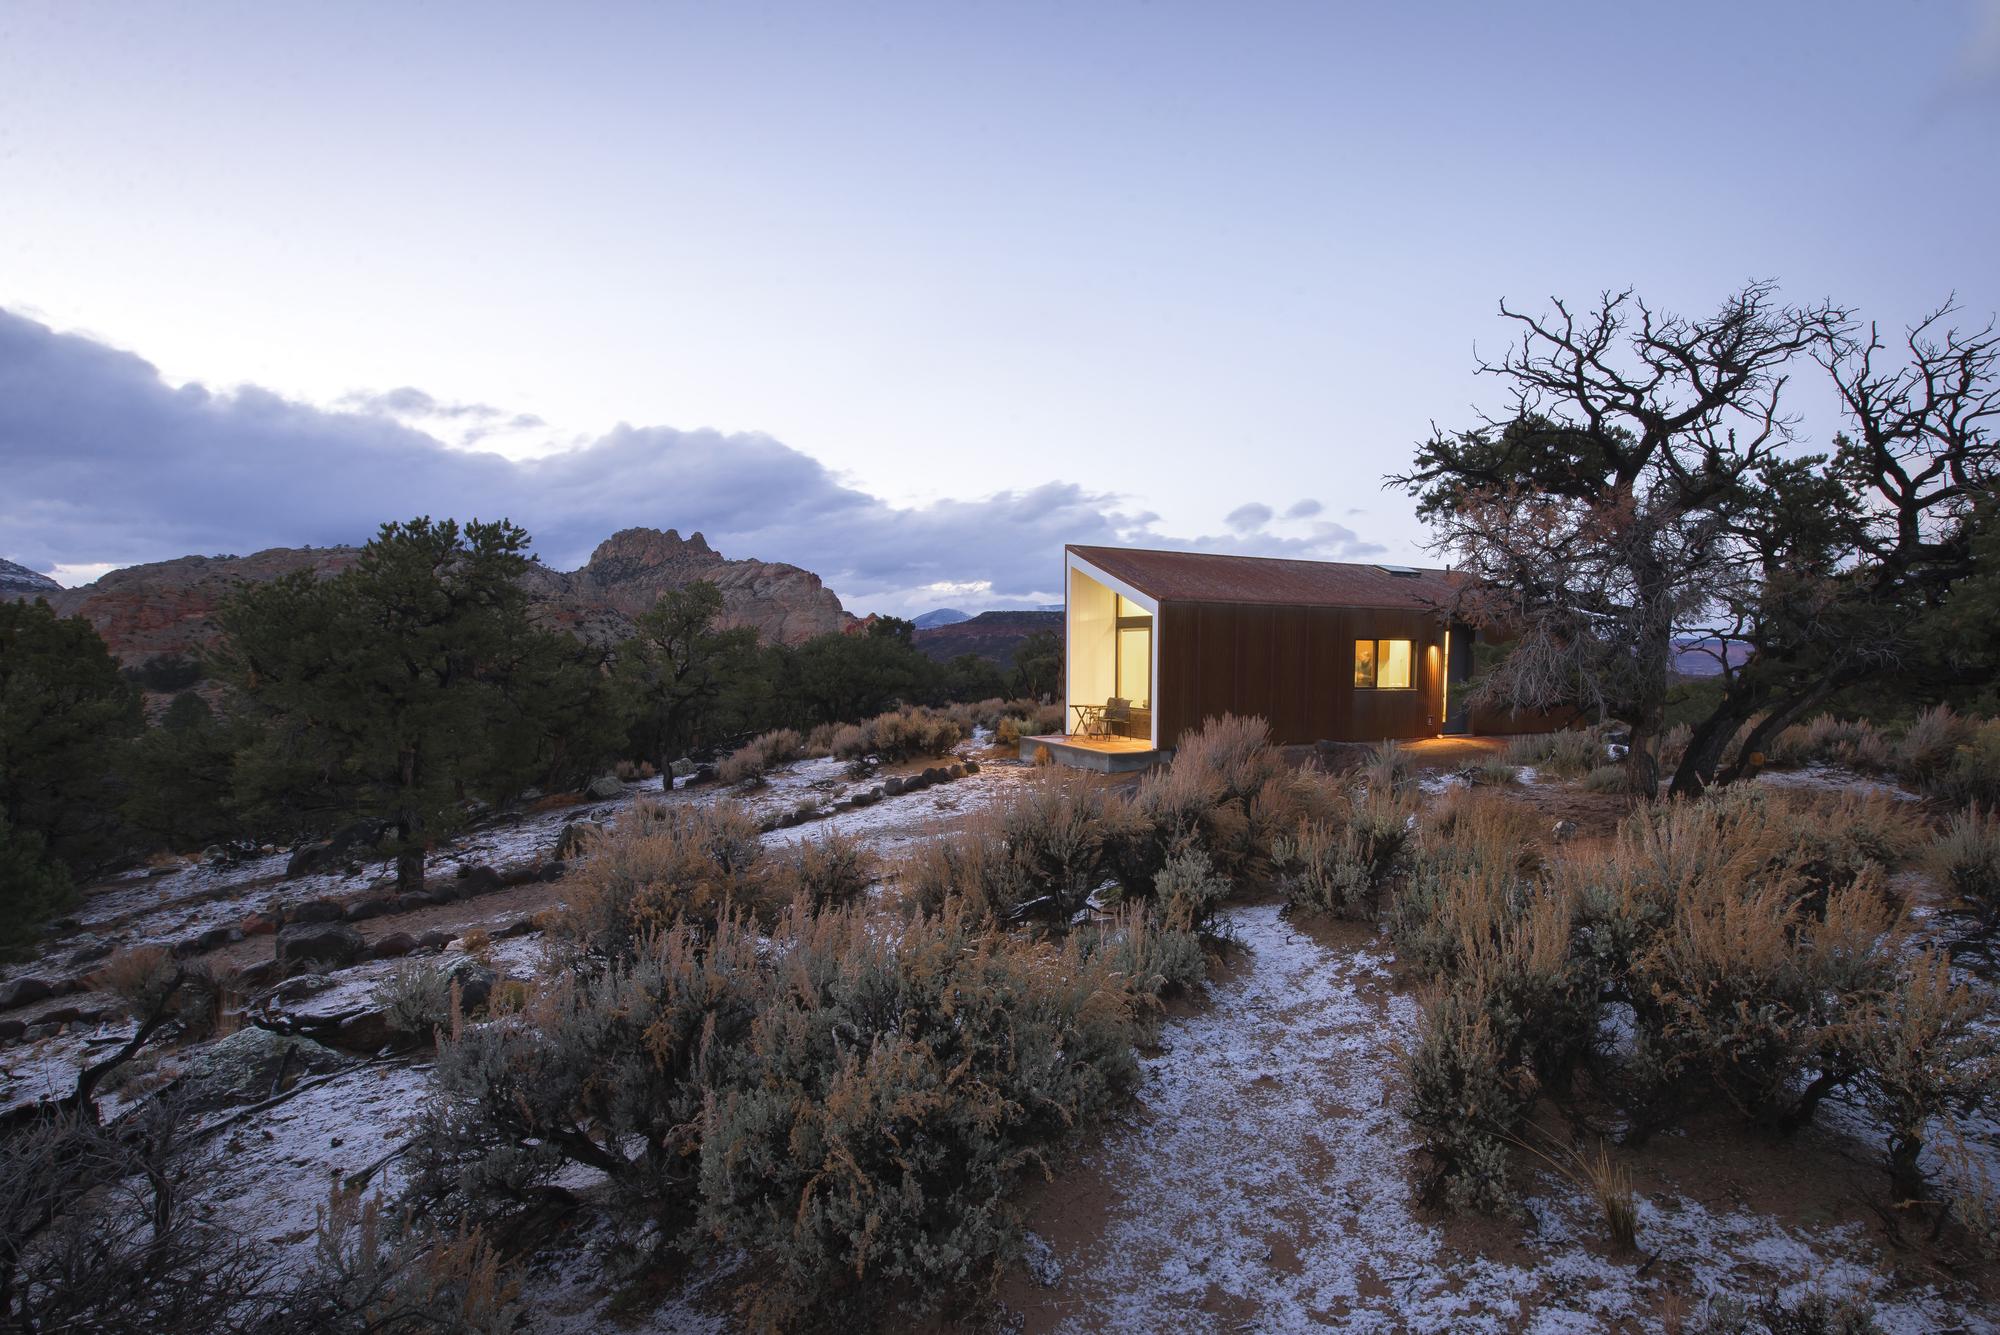 5522f95de58ecea119000056_capitol-reef-desert-dwelling-imbue-design_01_guest_house_context